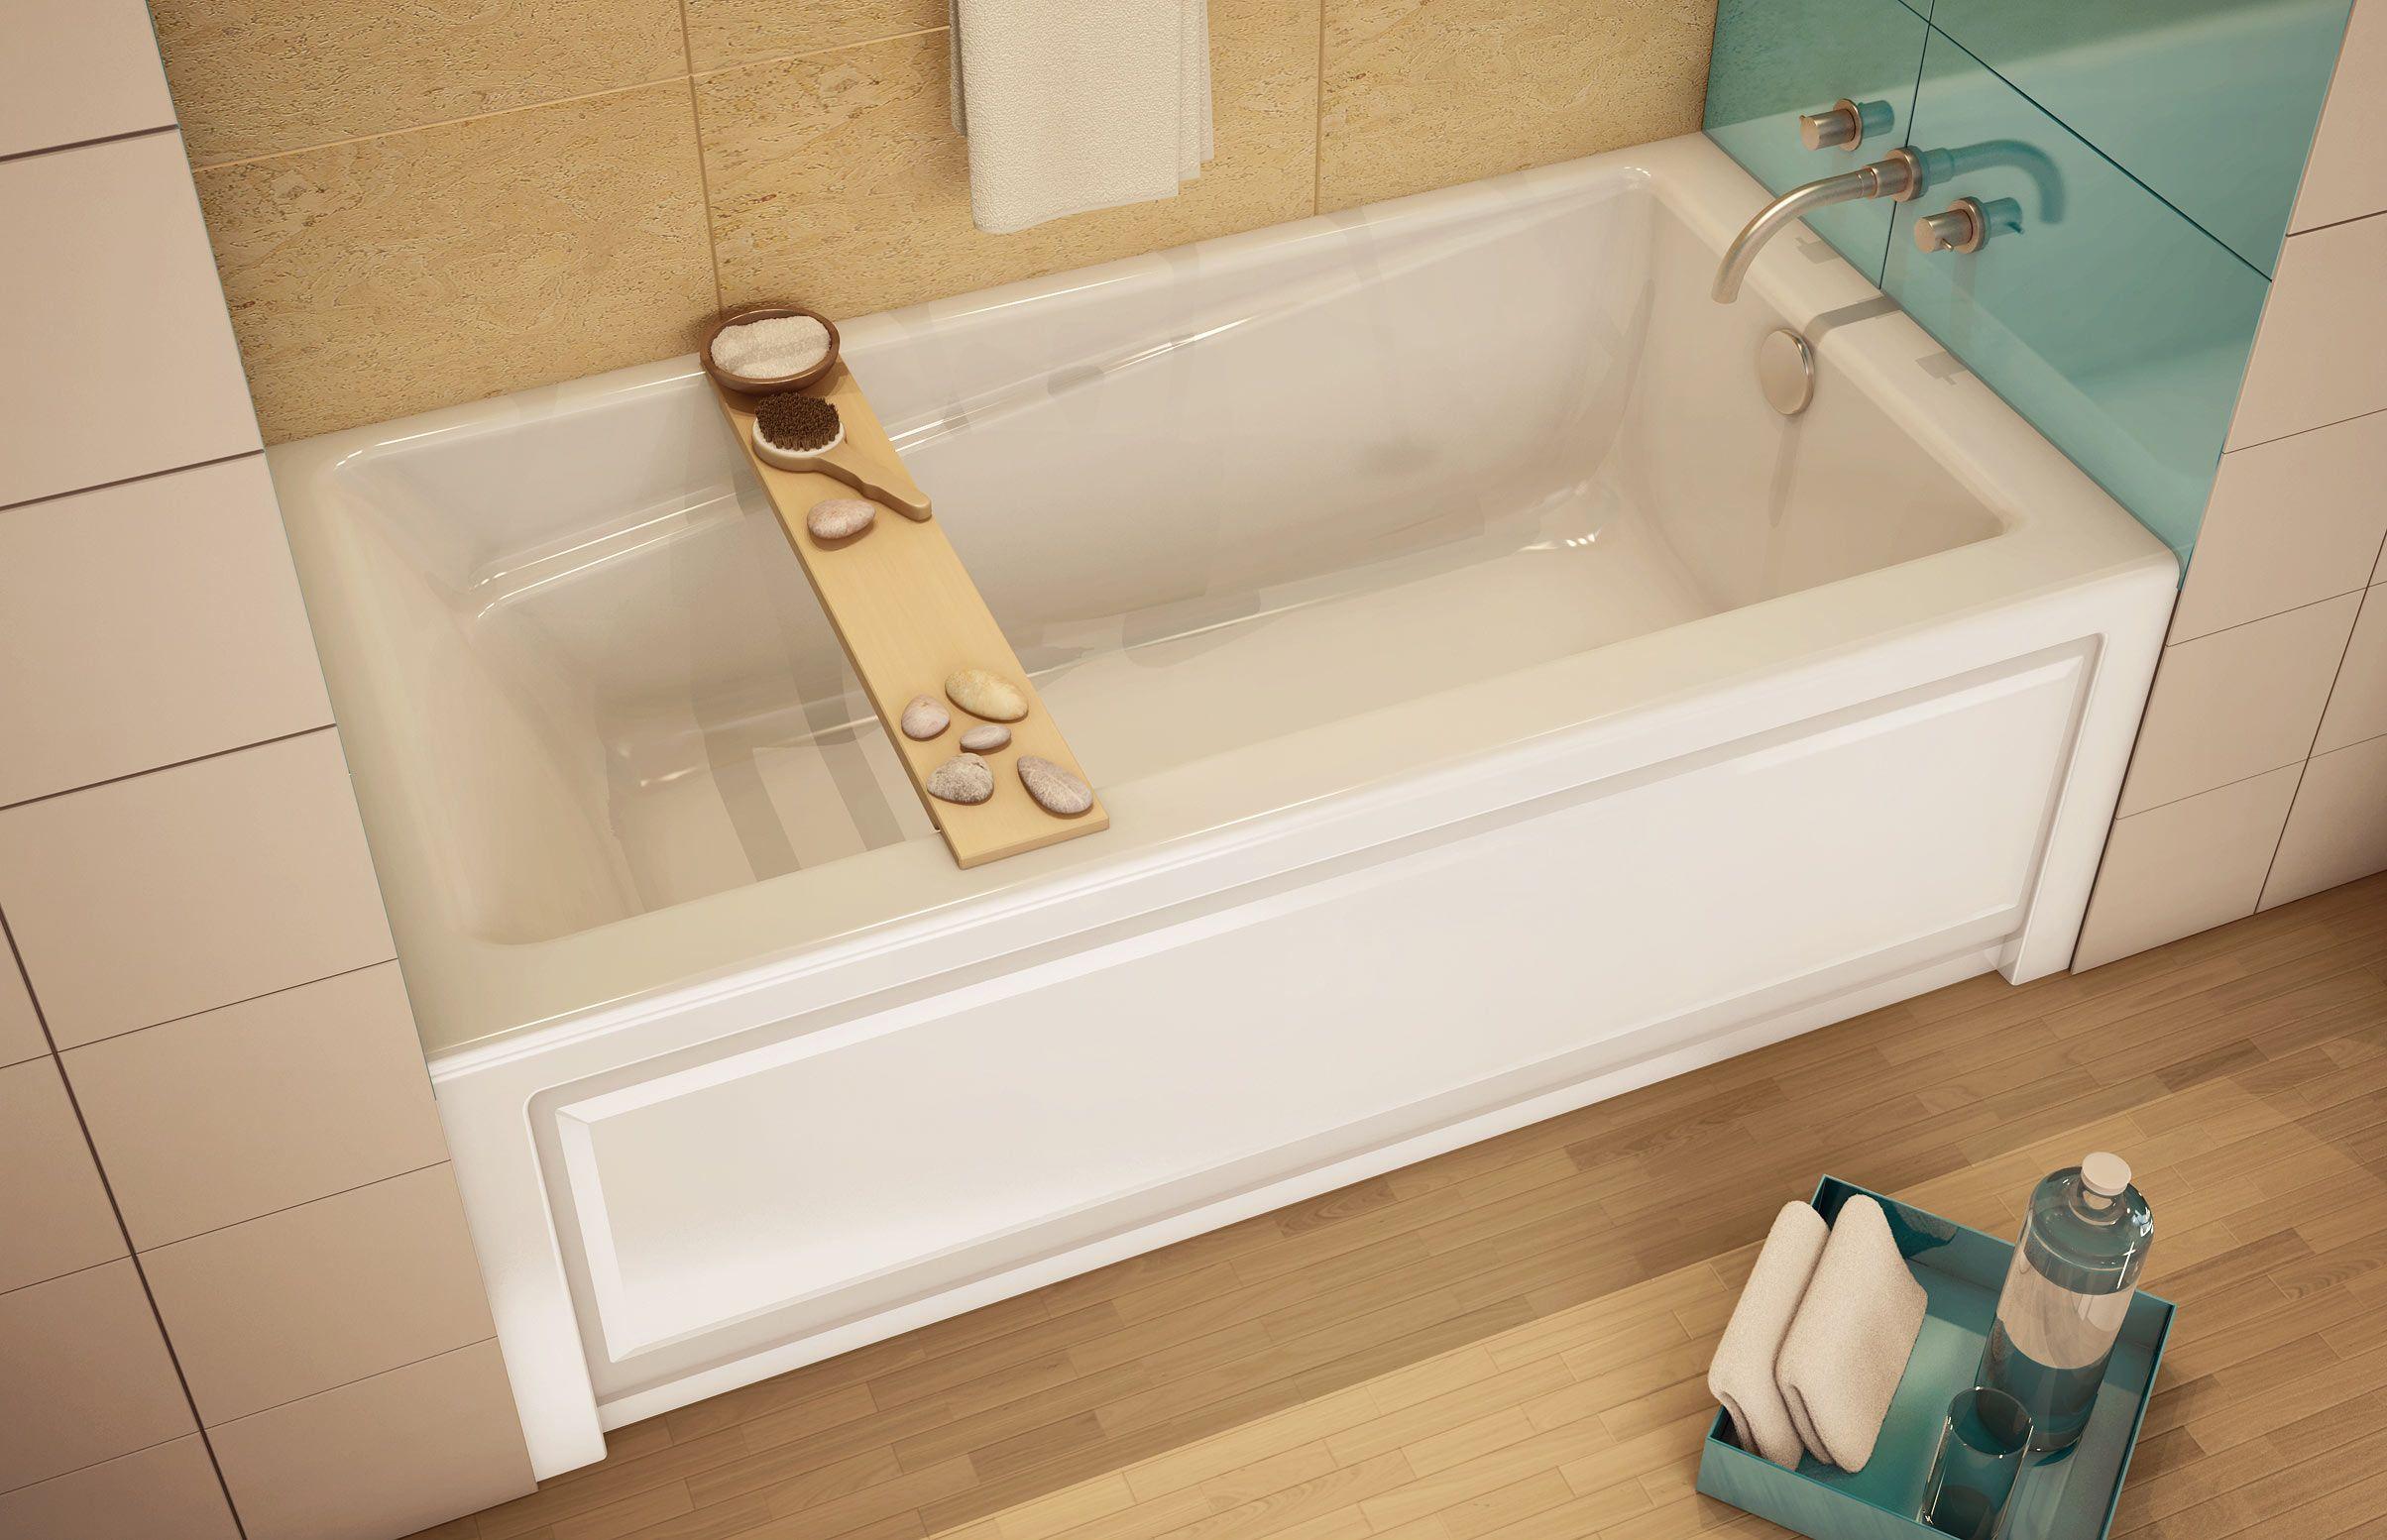 maax new town aerosens bathtub reviews